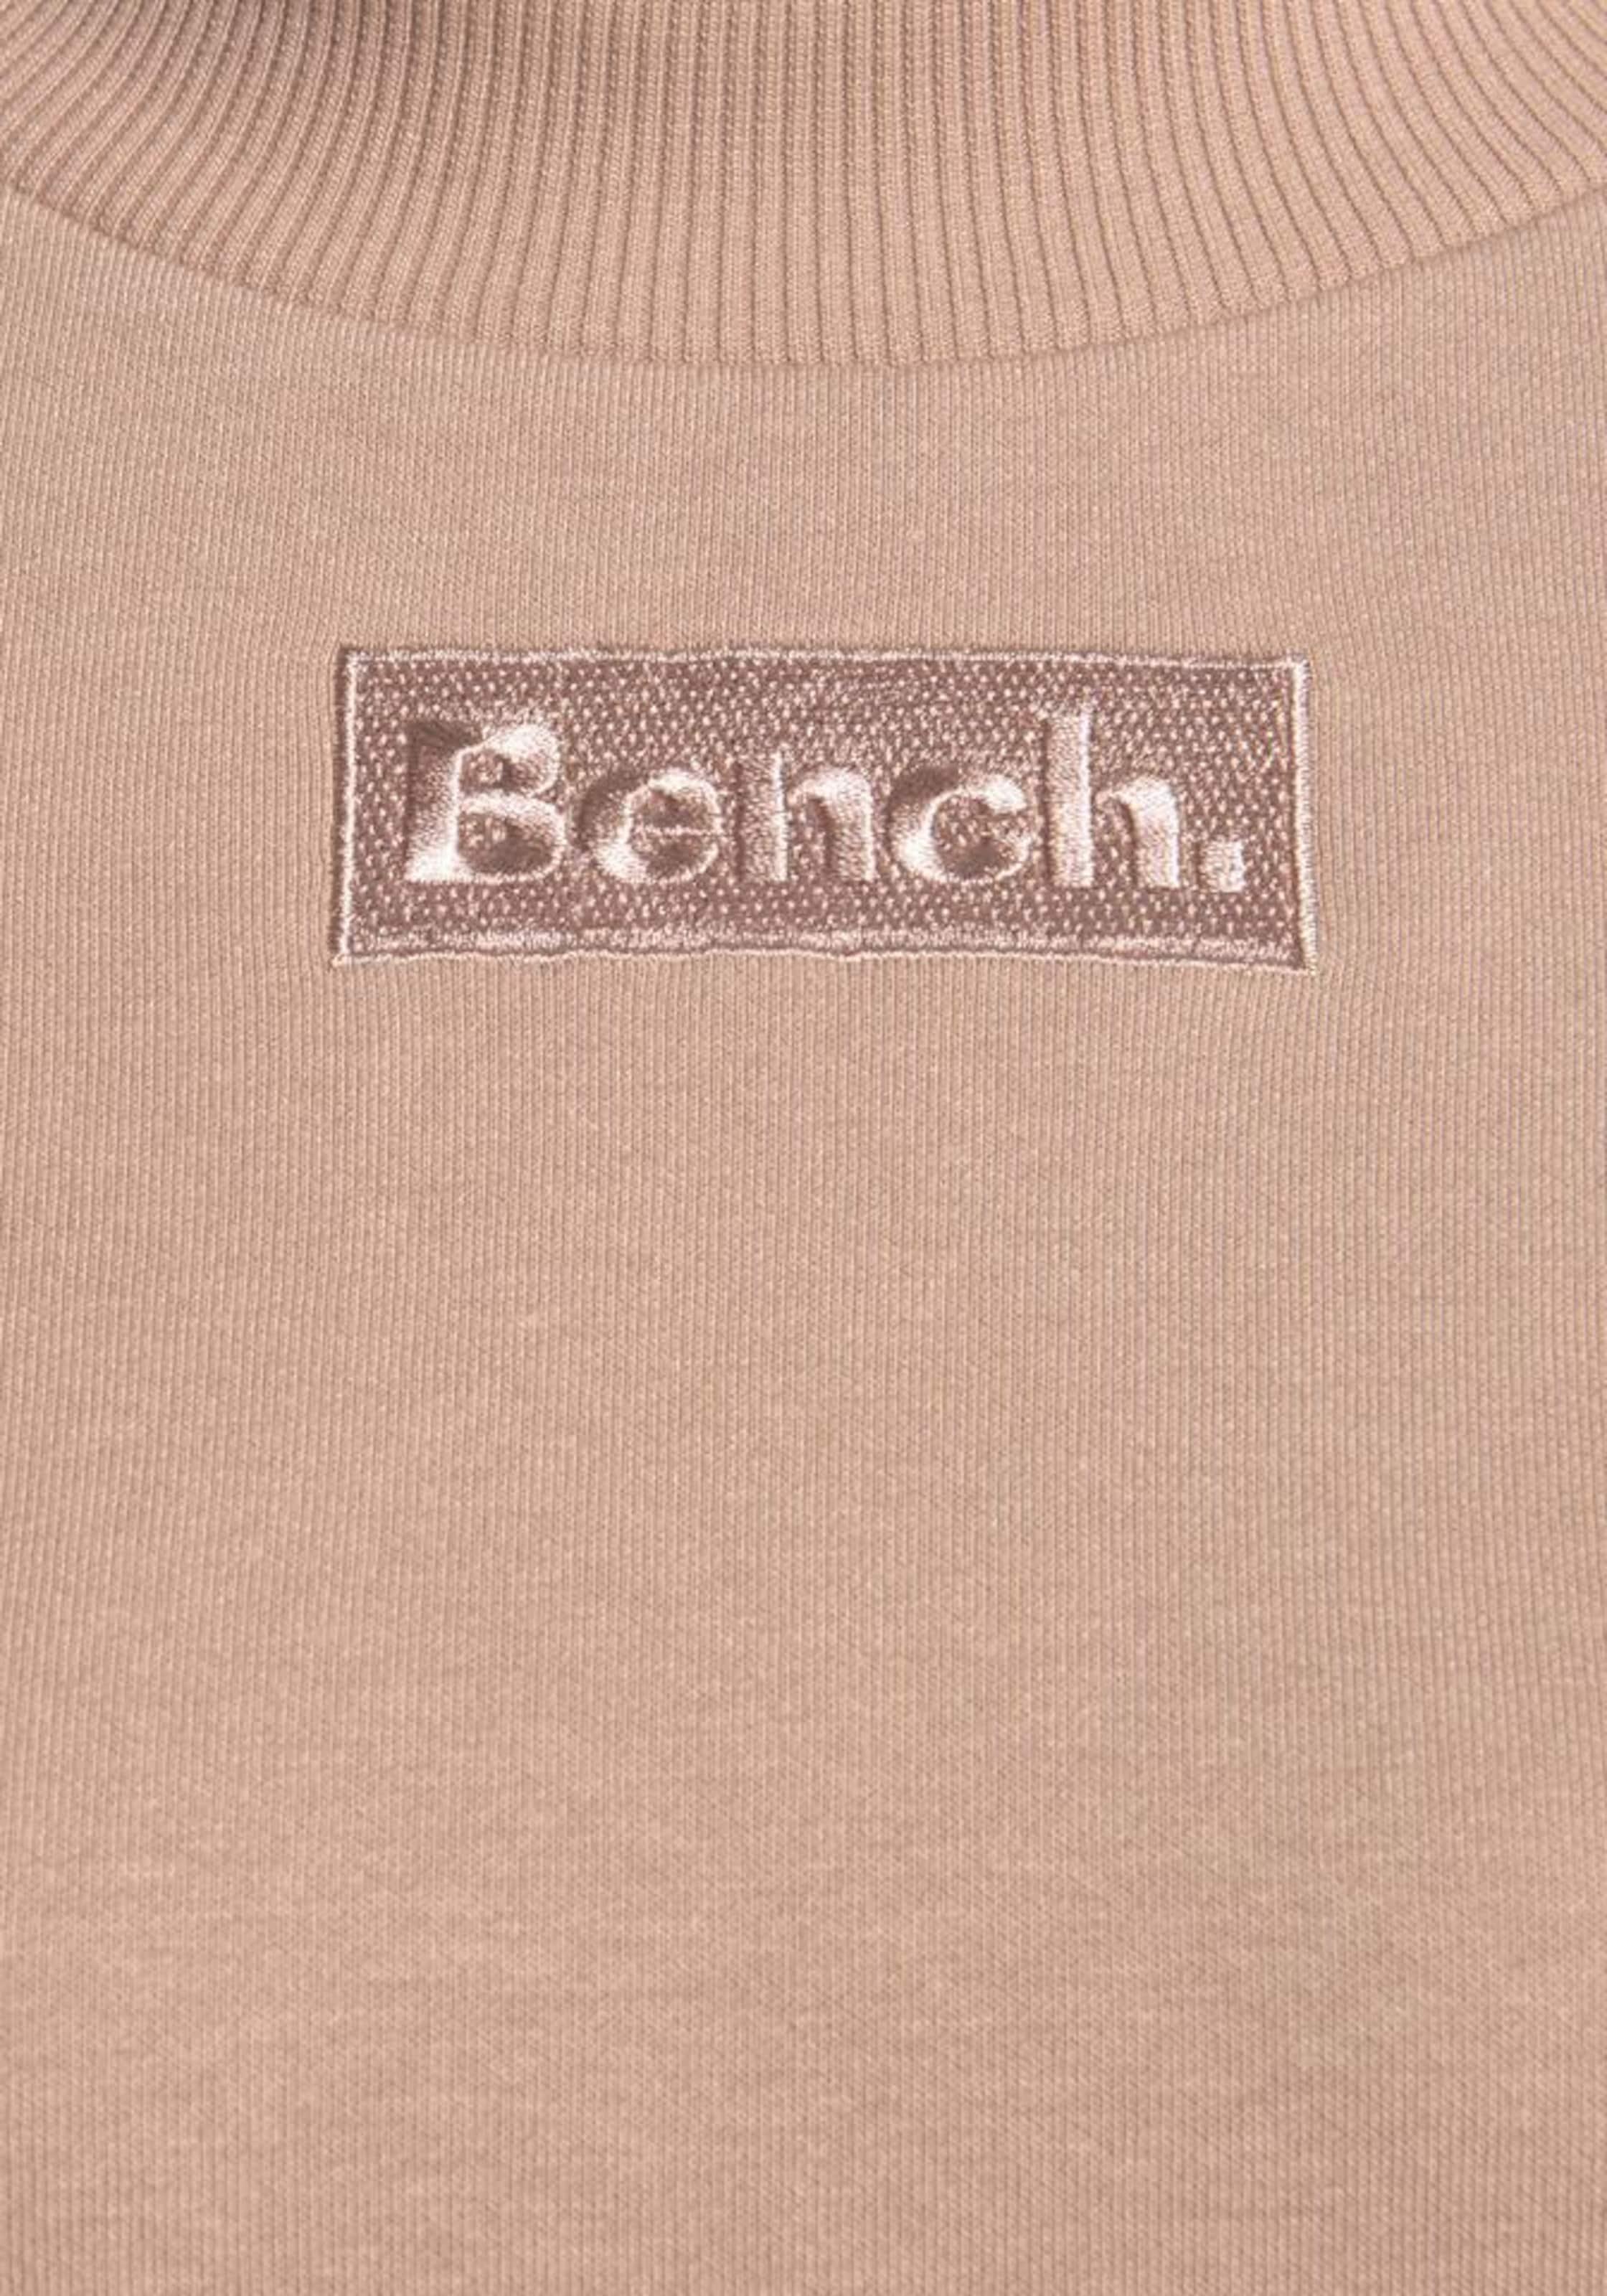 Bench In TaupeWeiß In Sweatkleid Sweatkleid In Bench TaupeWeiß Bench Sweatkleid TaupeWeiß 1JcKlF